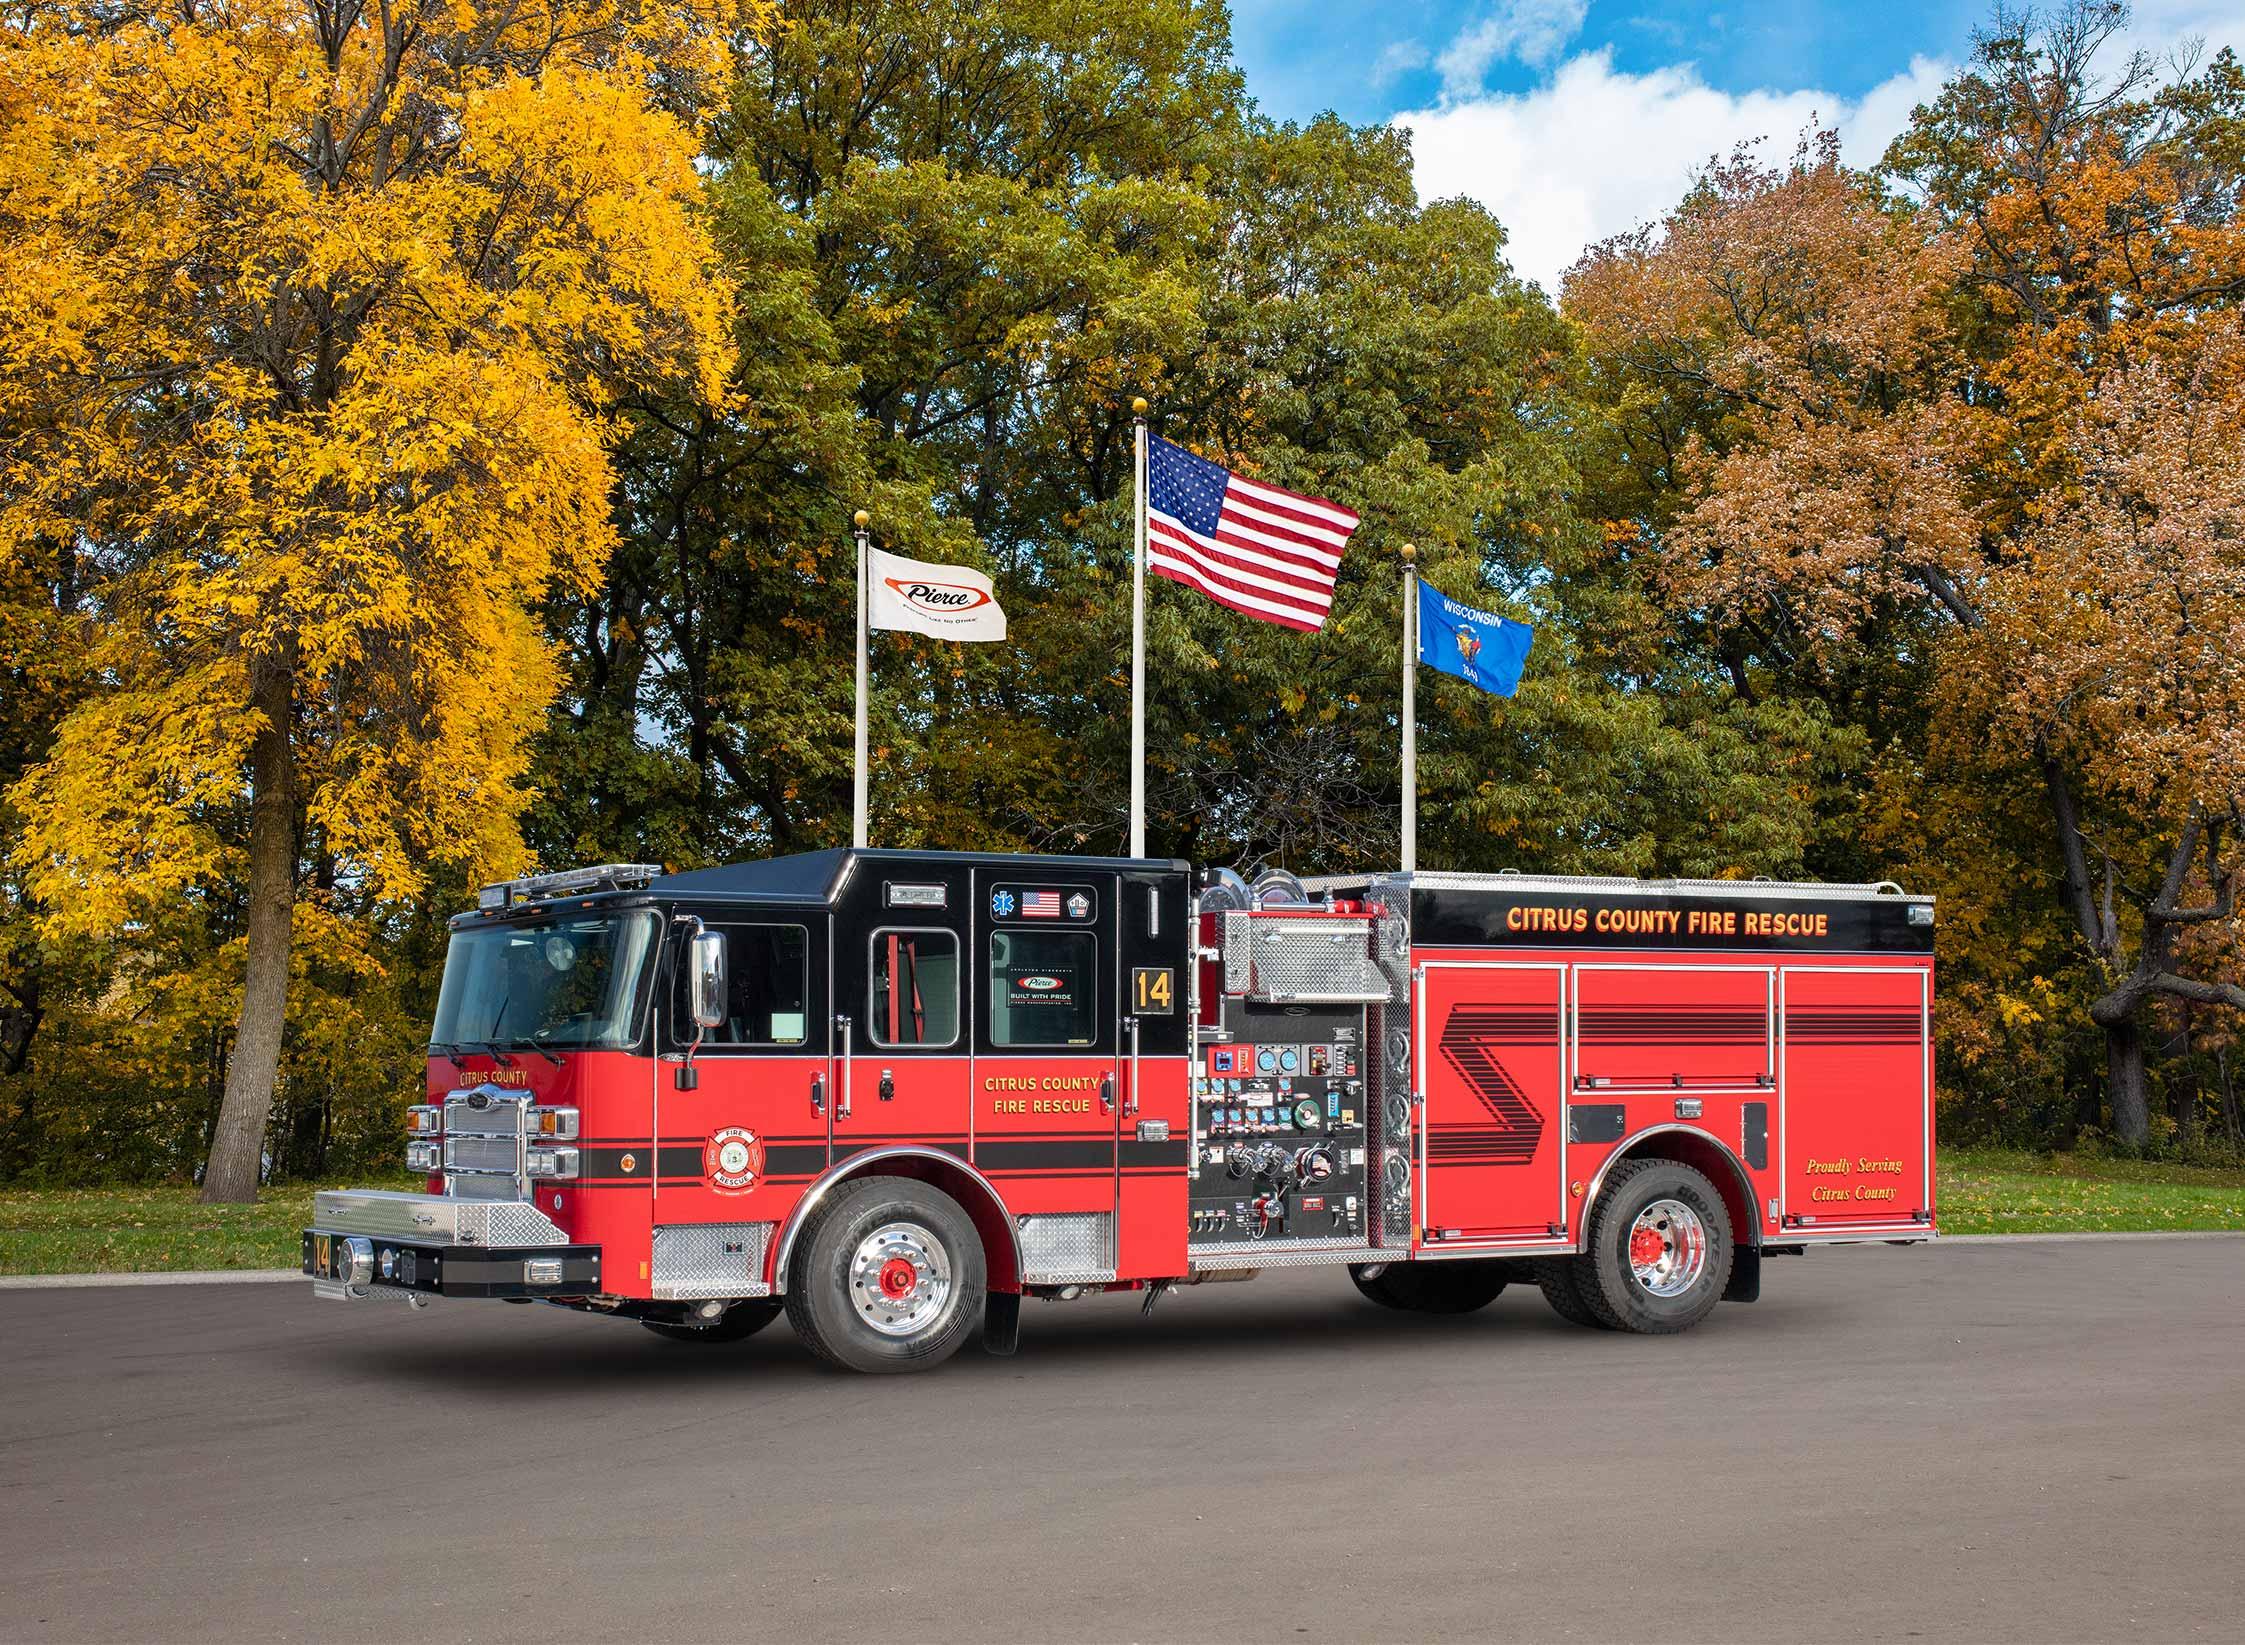 Citrus County Fire Rescue - Pumper